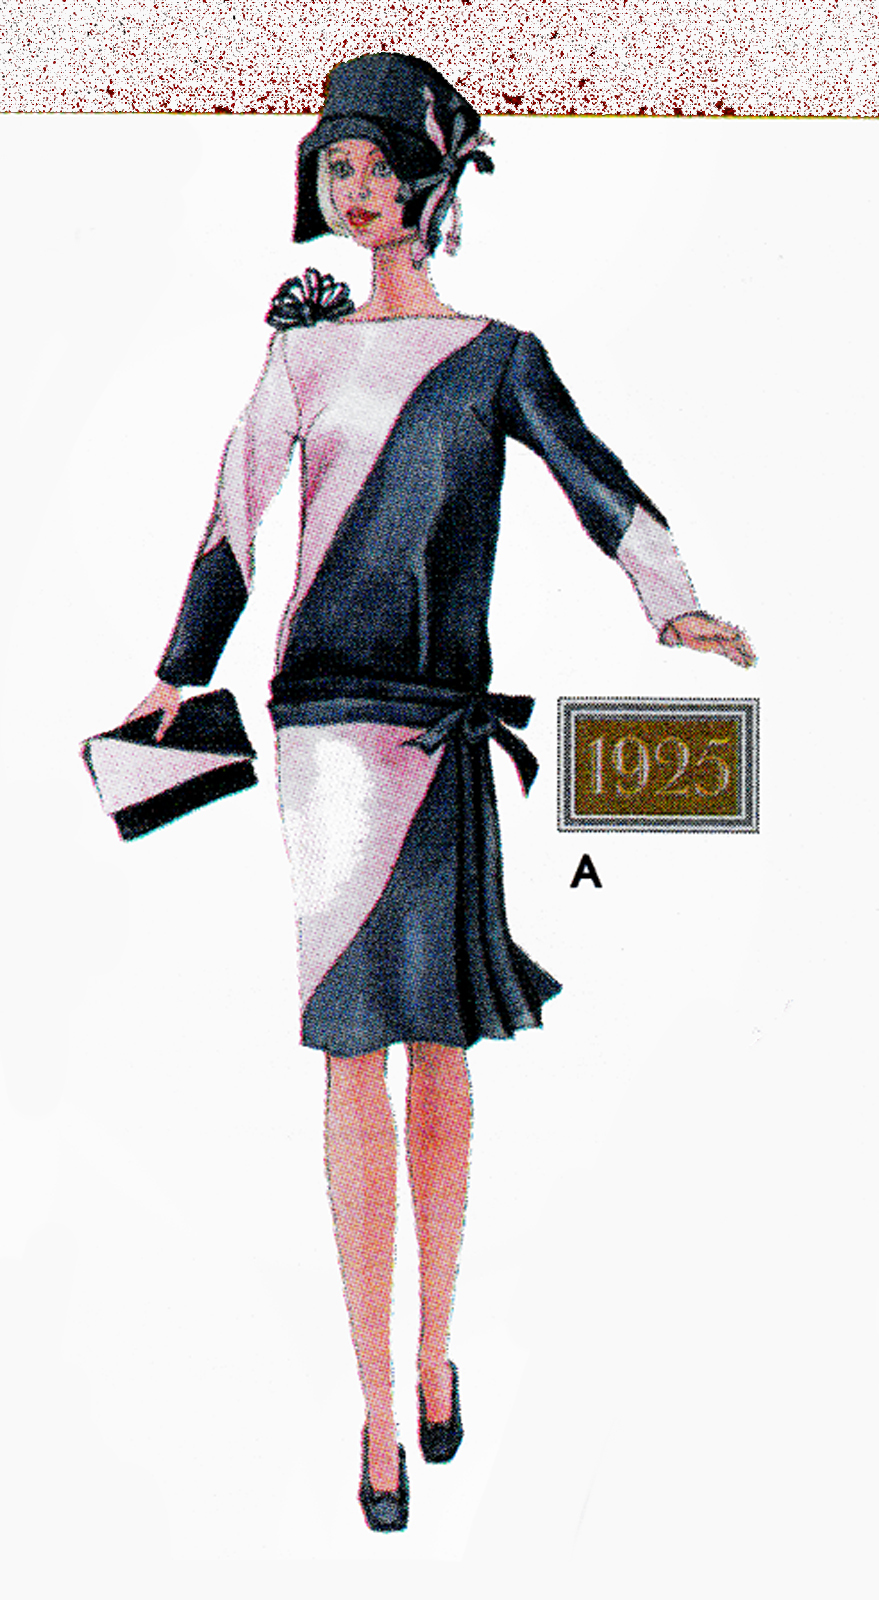 "C.1920's BARBIE 11.5"" DOLL HATS BAGS FLAPPER SIMPLICITY ..."